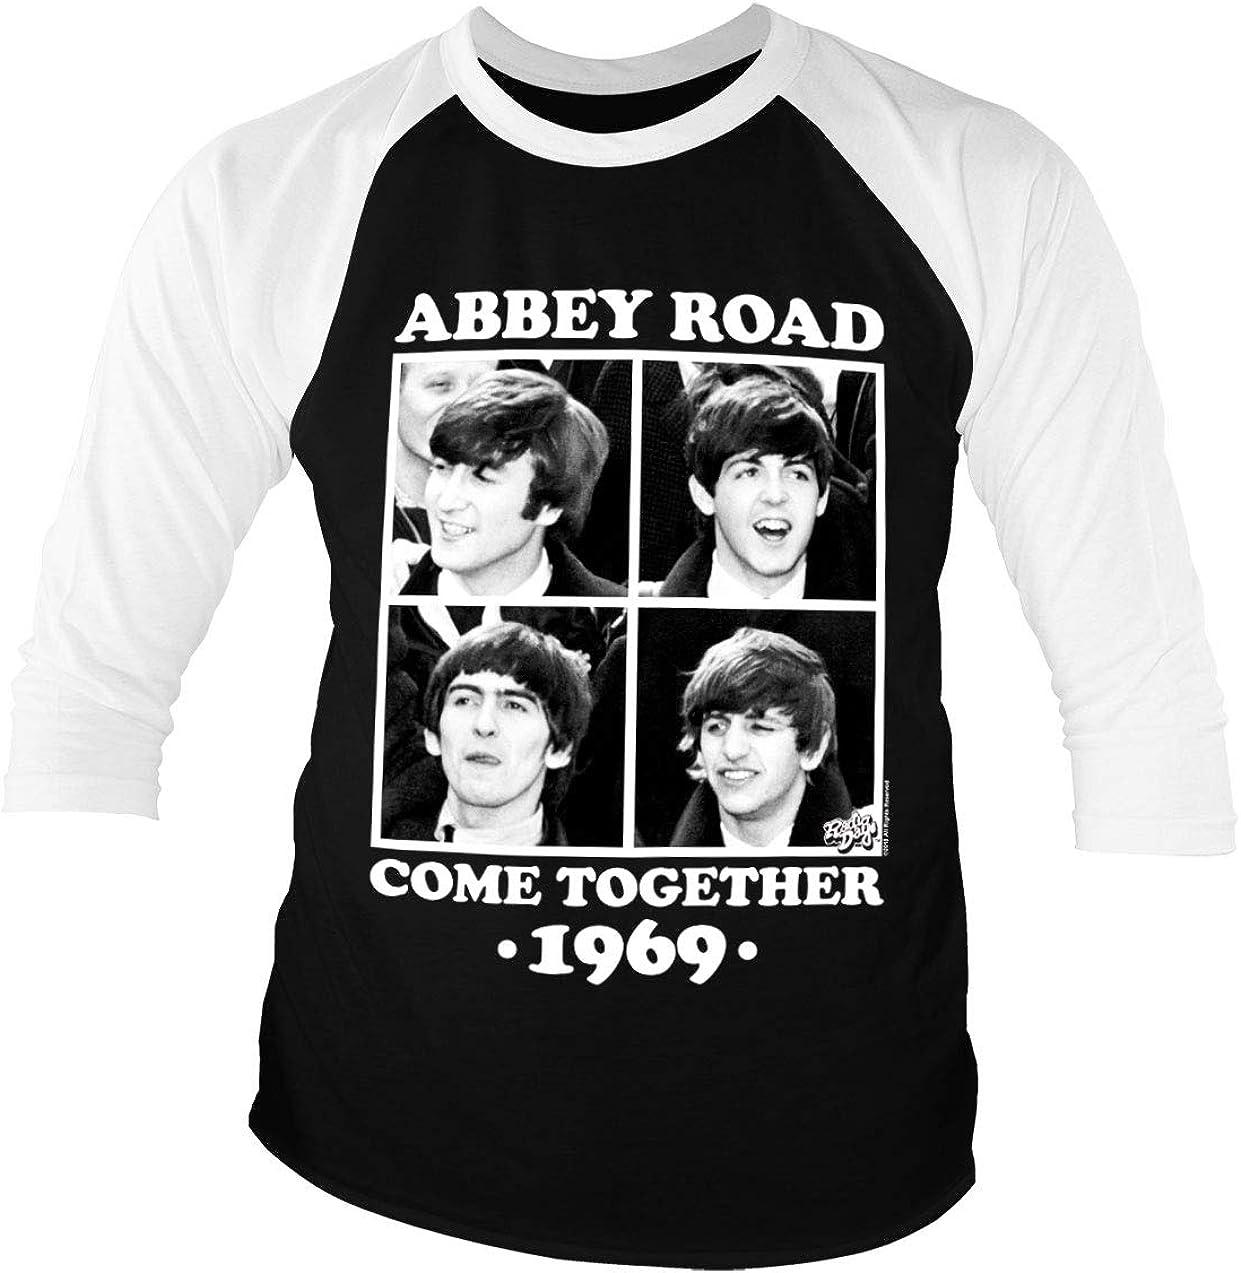 Licenciado Oficialmente Abbey Road - Come Together Baseball Camisa de Manga 3/4 para Hombre (Negro-Blanco)